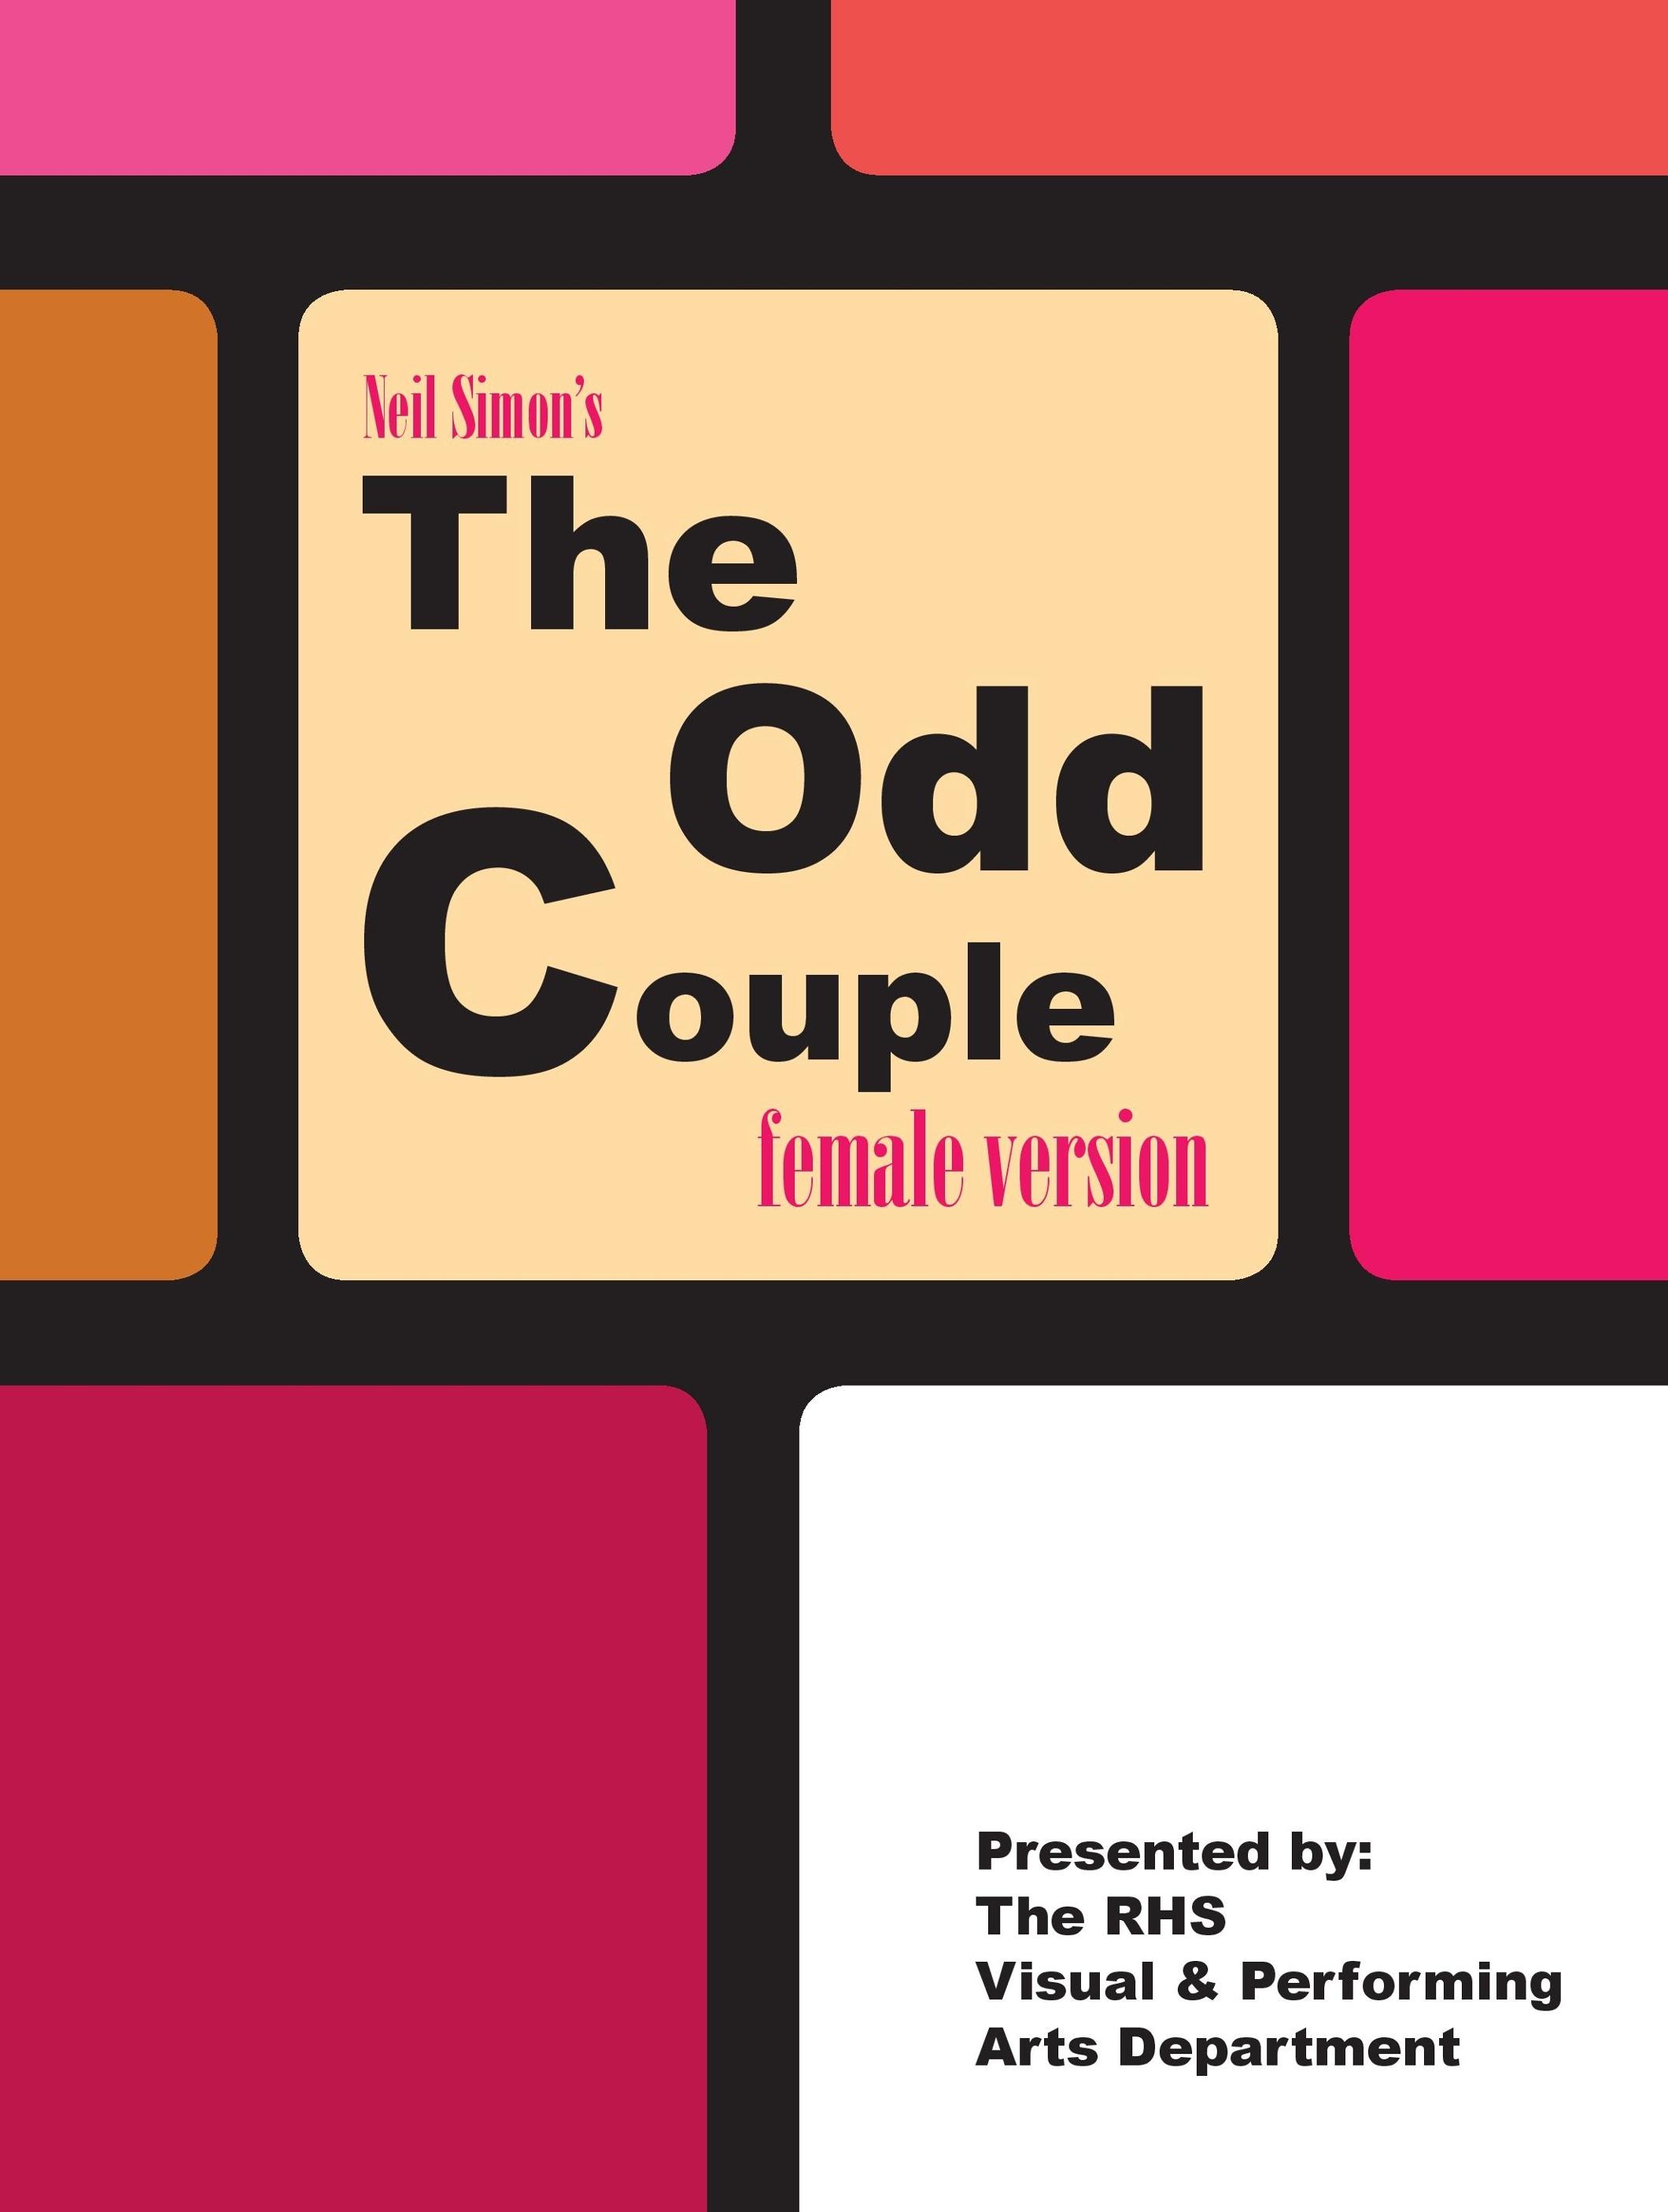 The Odd Couple 2019